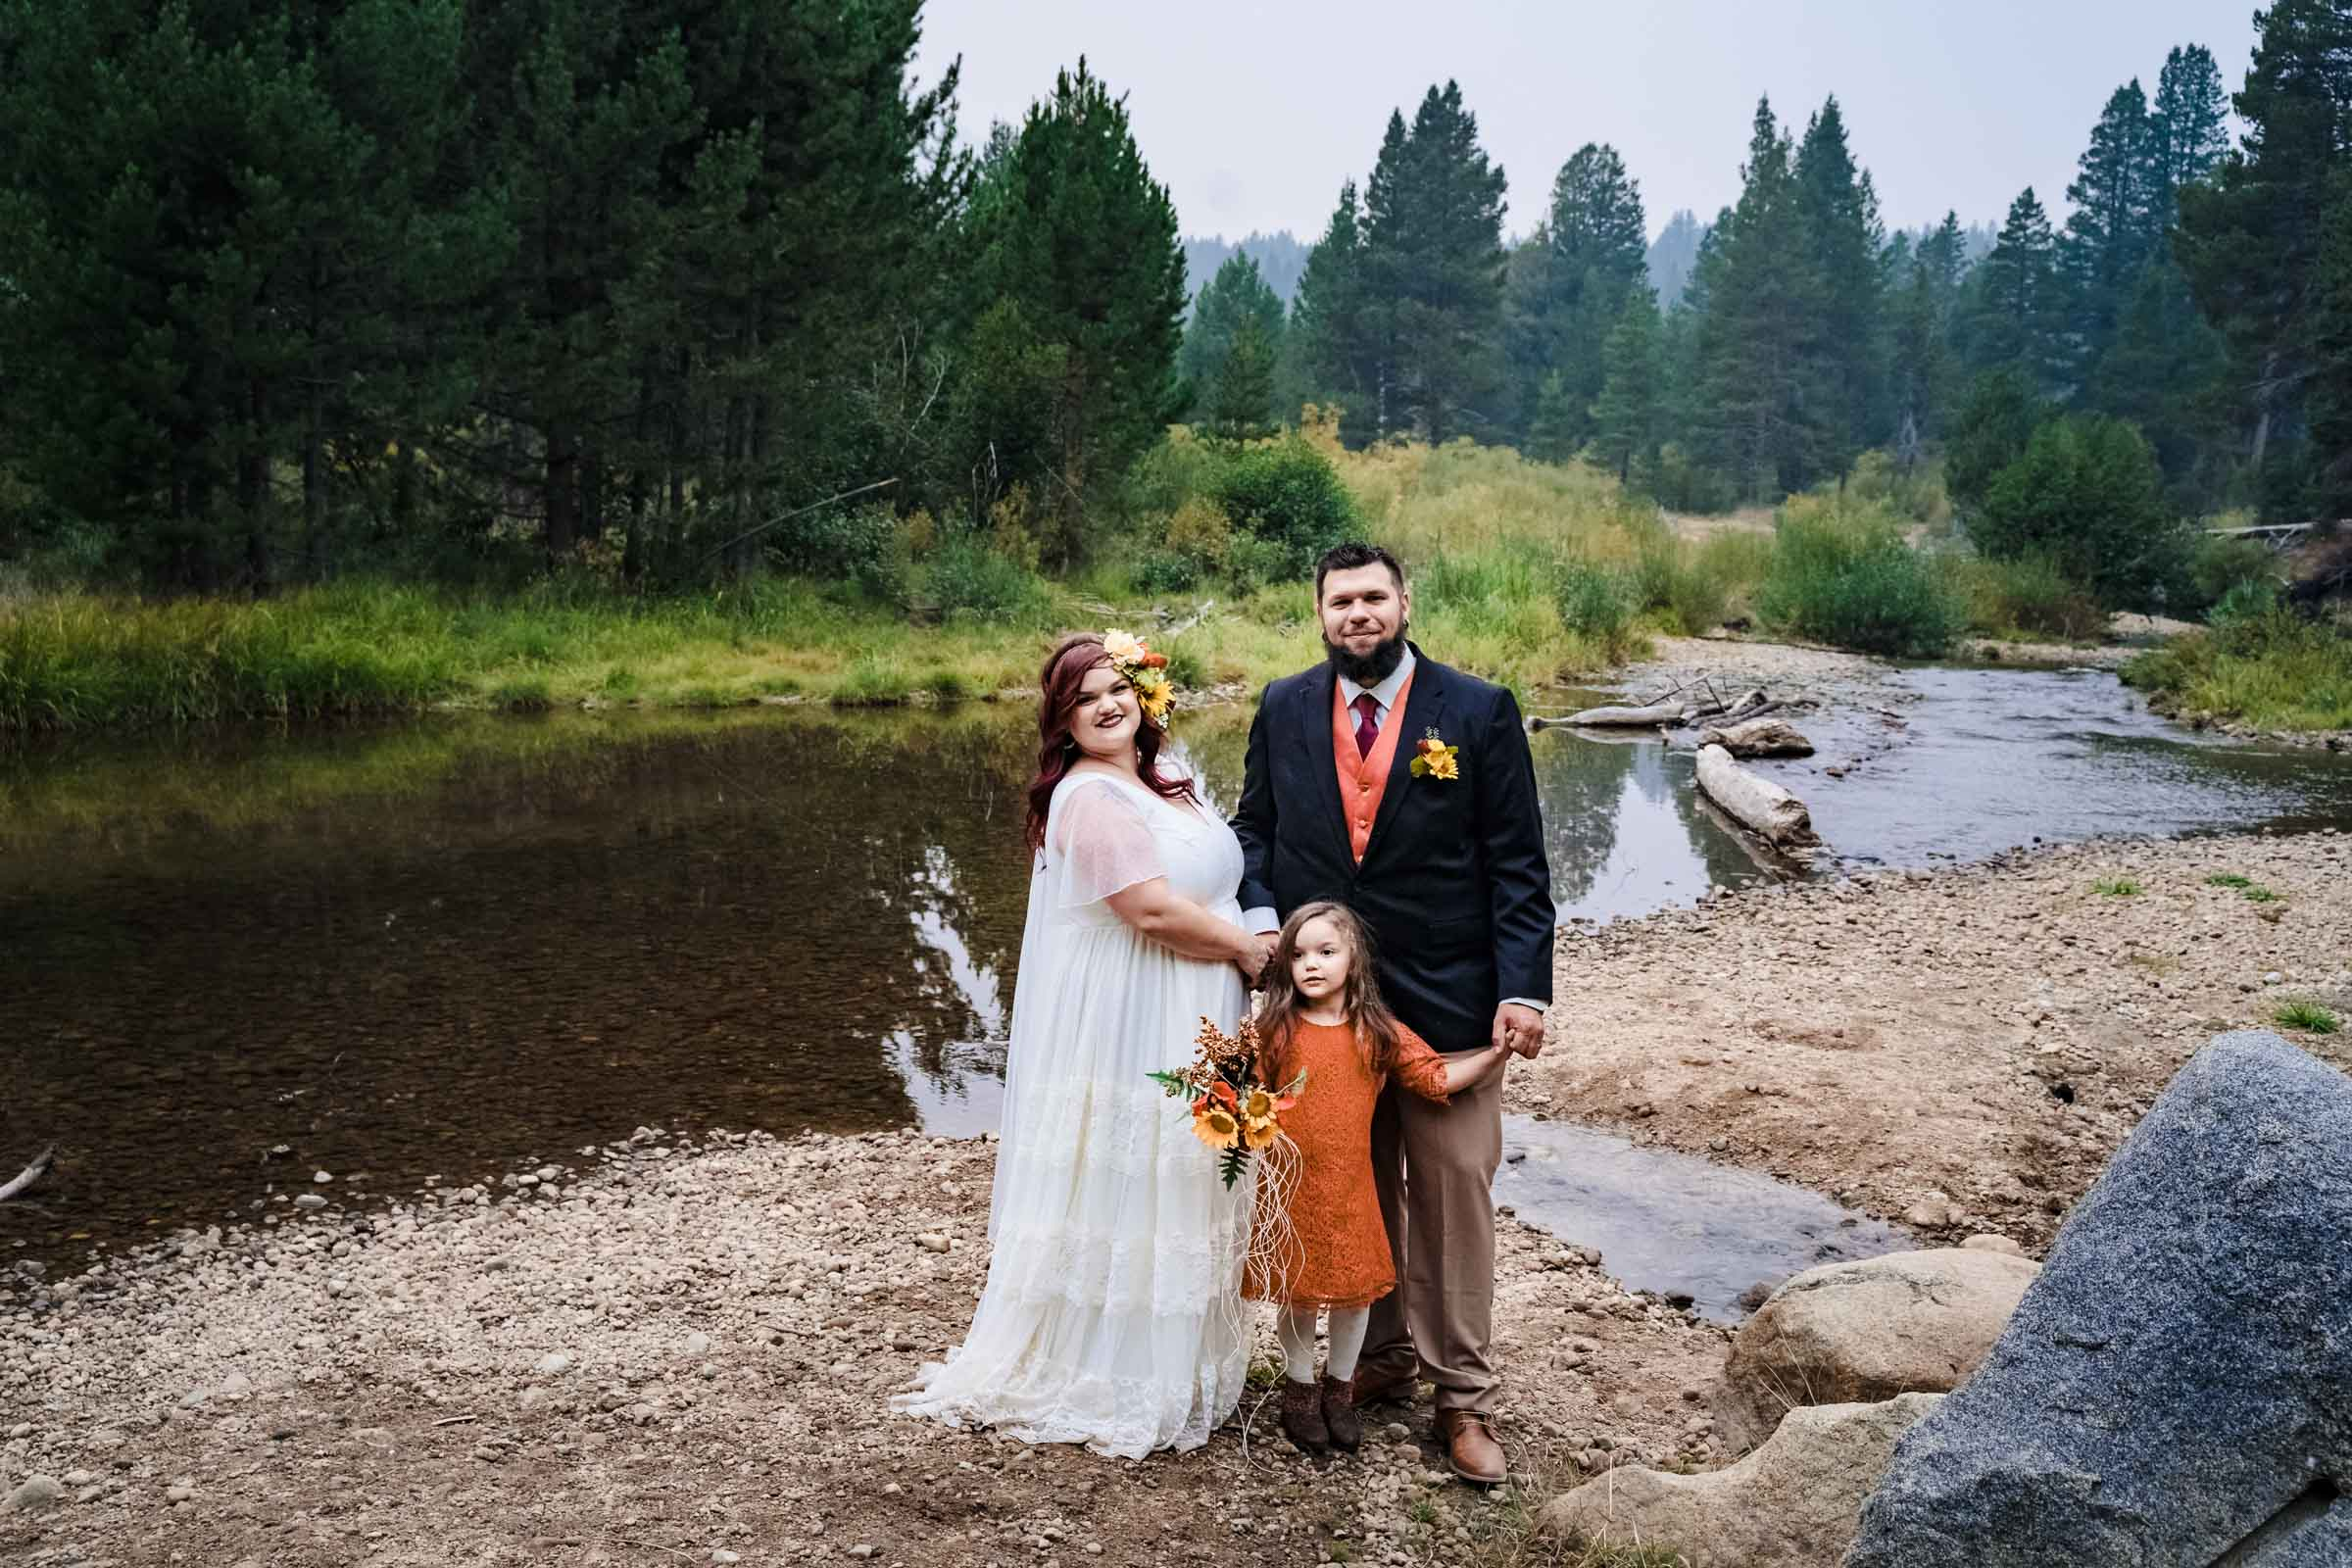 Intimate wedding in South Lake Tahoe